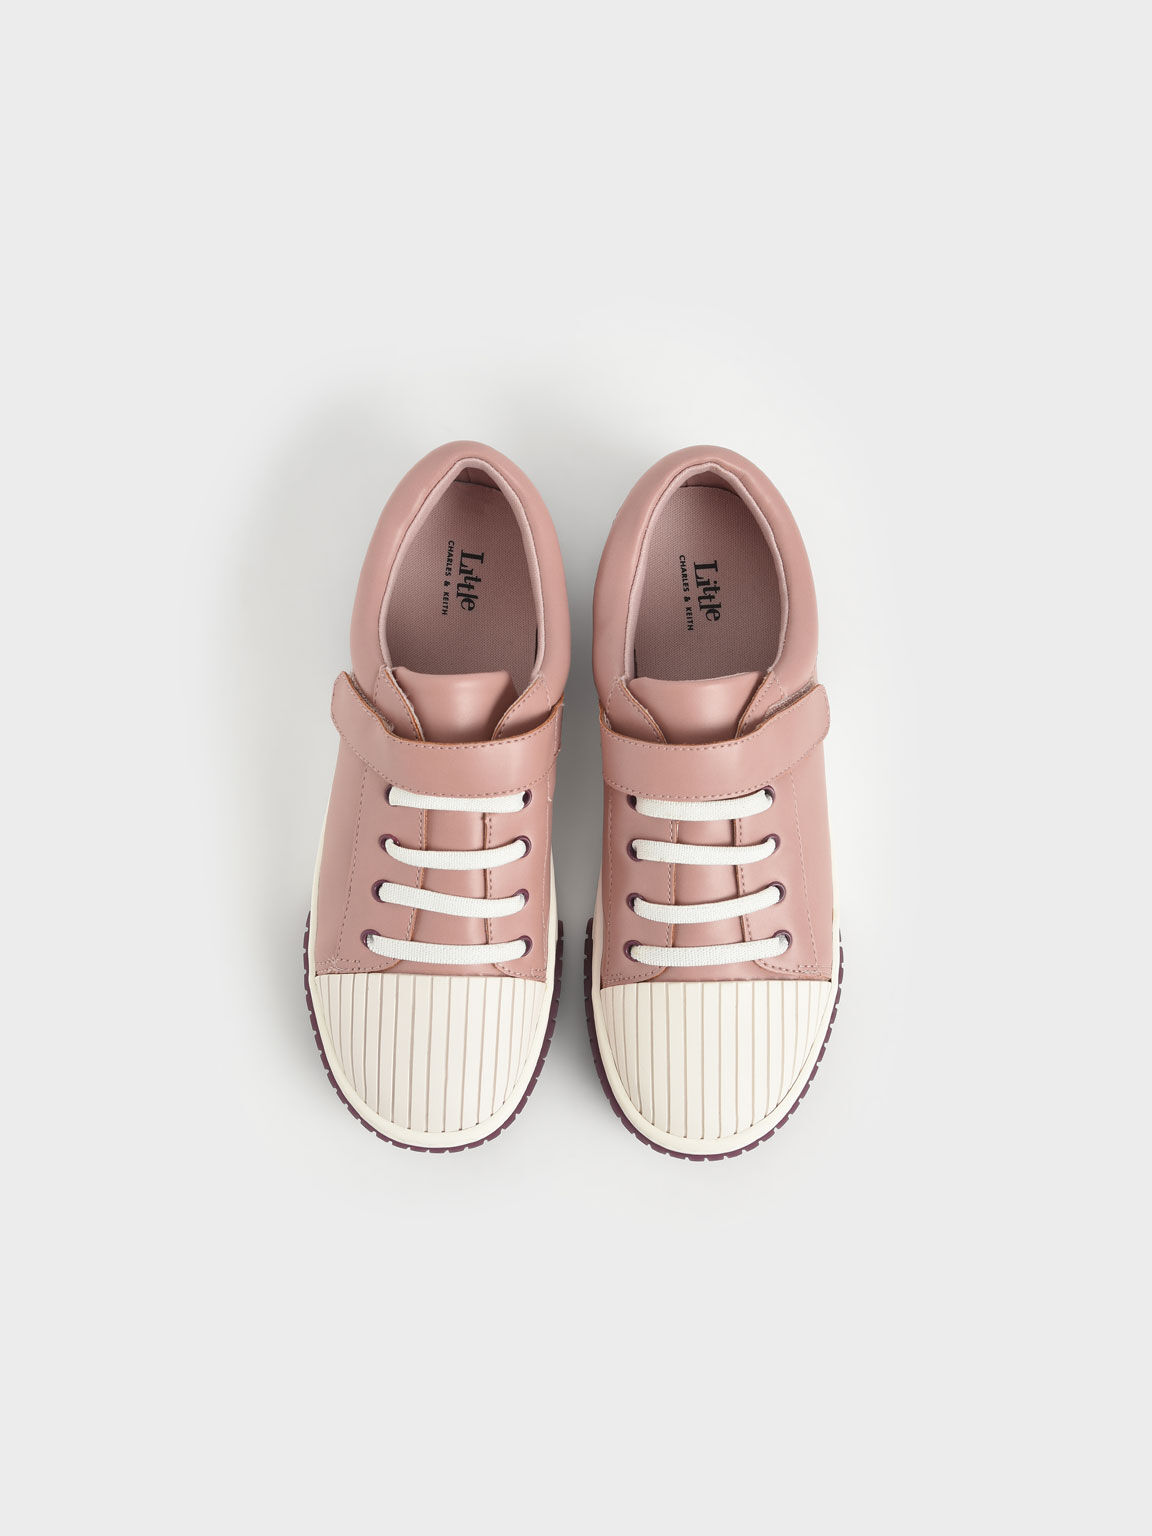 Girls' Platform Trainers, Pink, hi-res